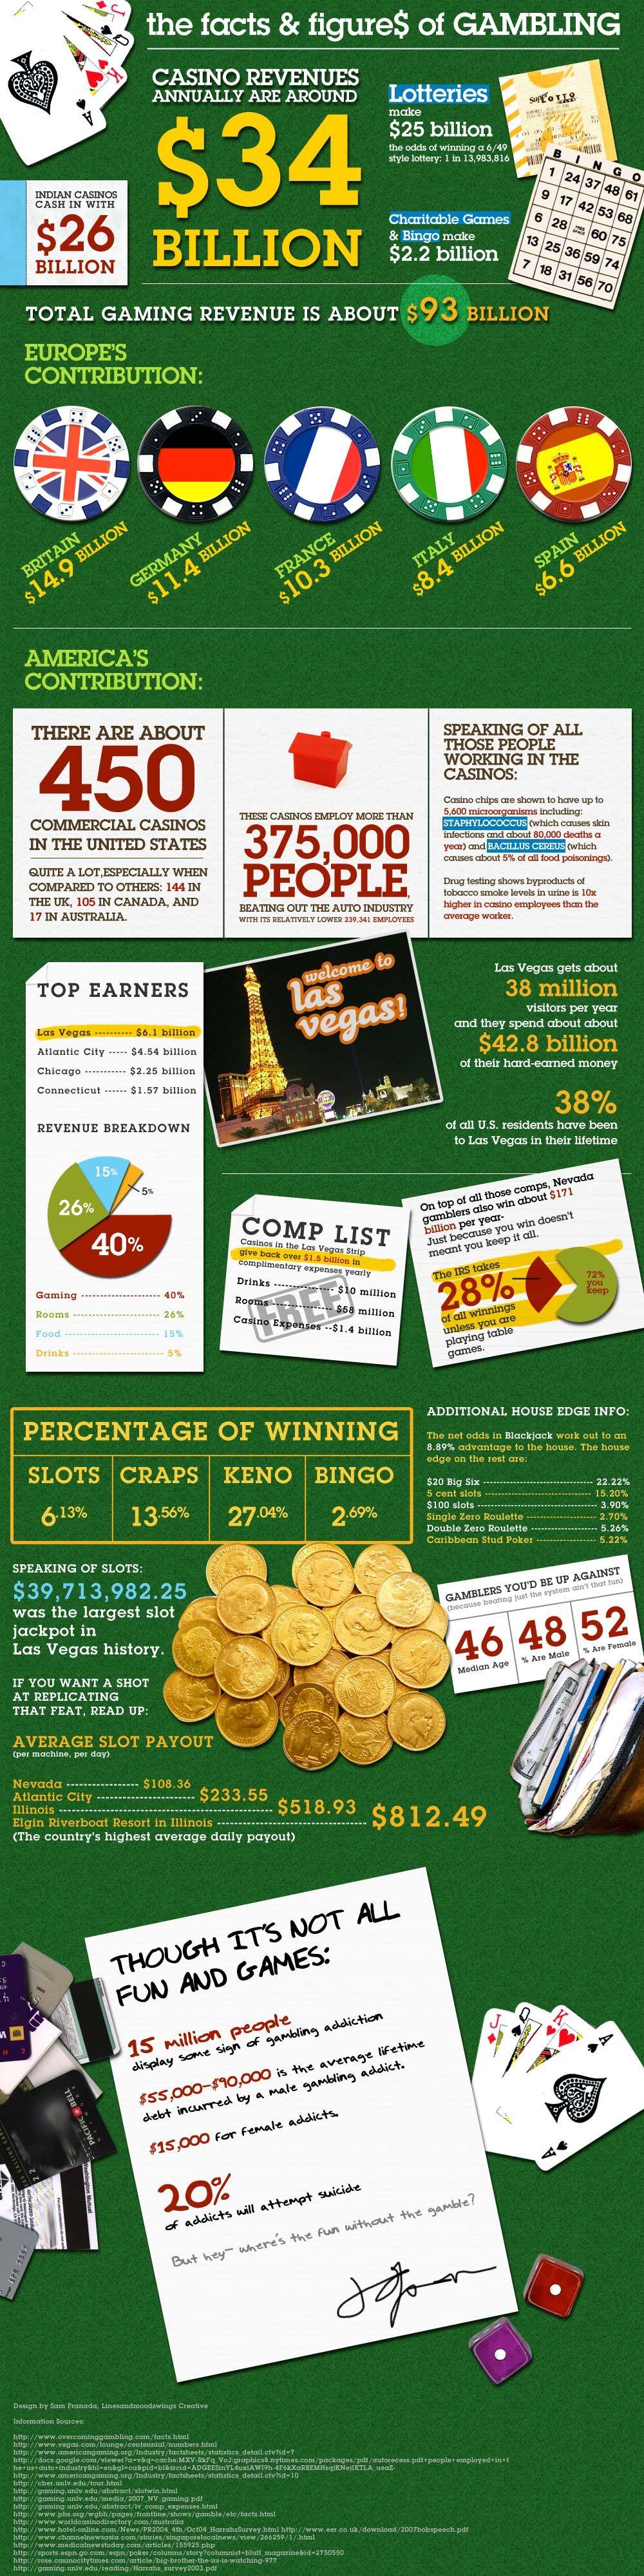 Casino slot statistics